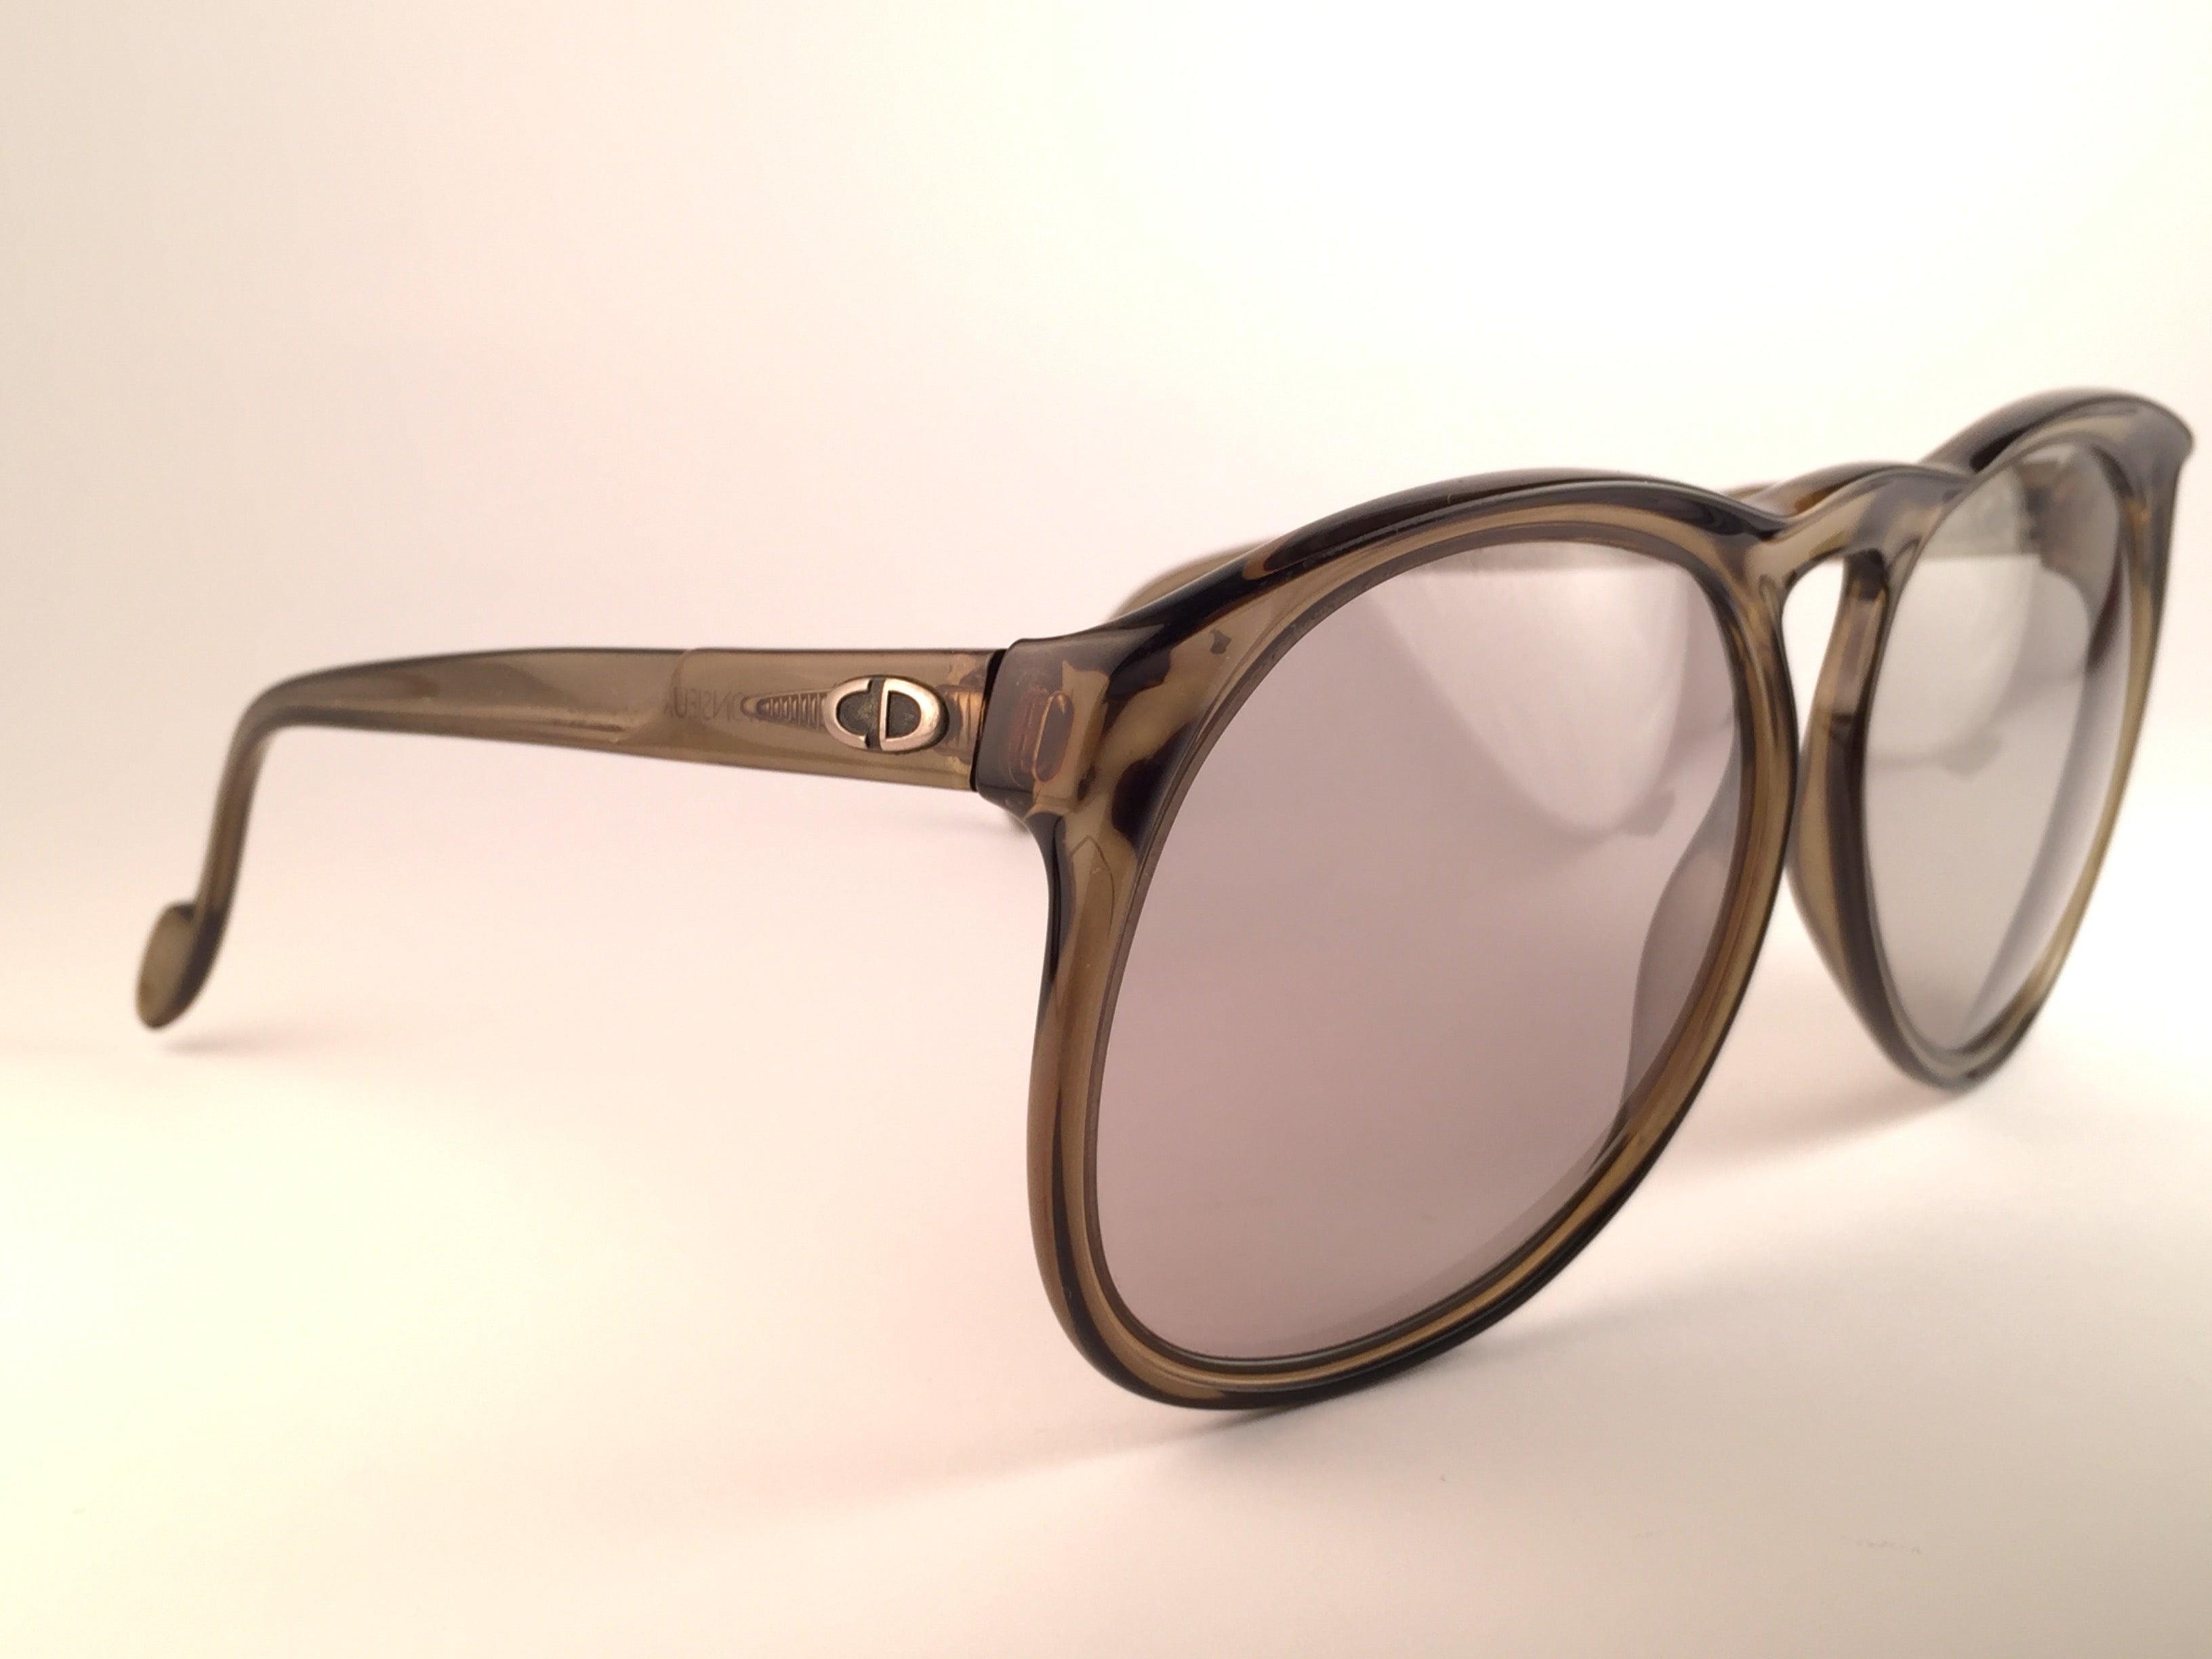 a3c88ed457c New Vintage Christian Dior Monsieur D62 Oversized Green Optyl Austria  Sunglasses at 1stdibs